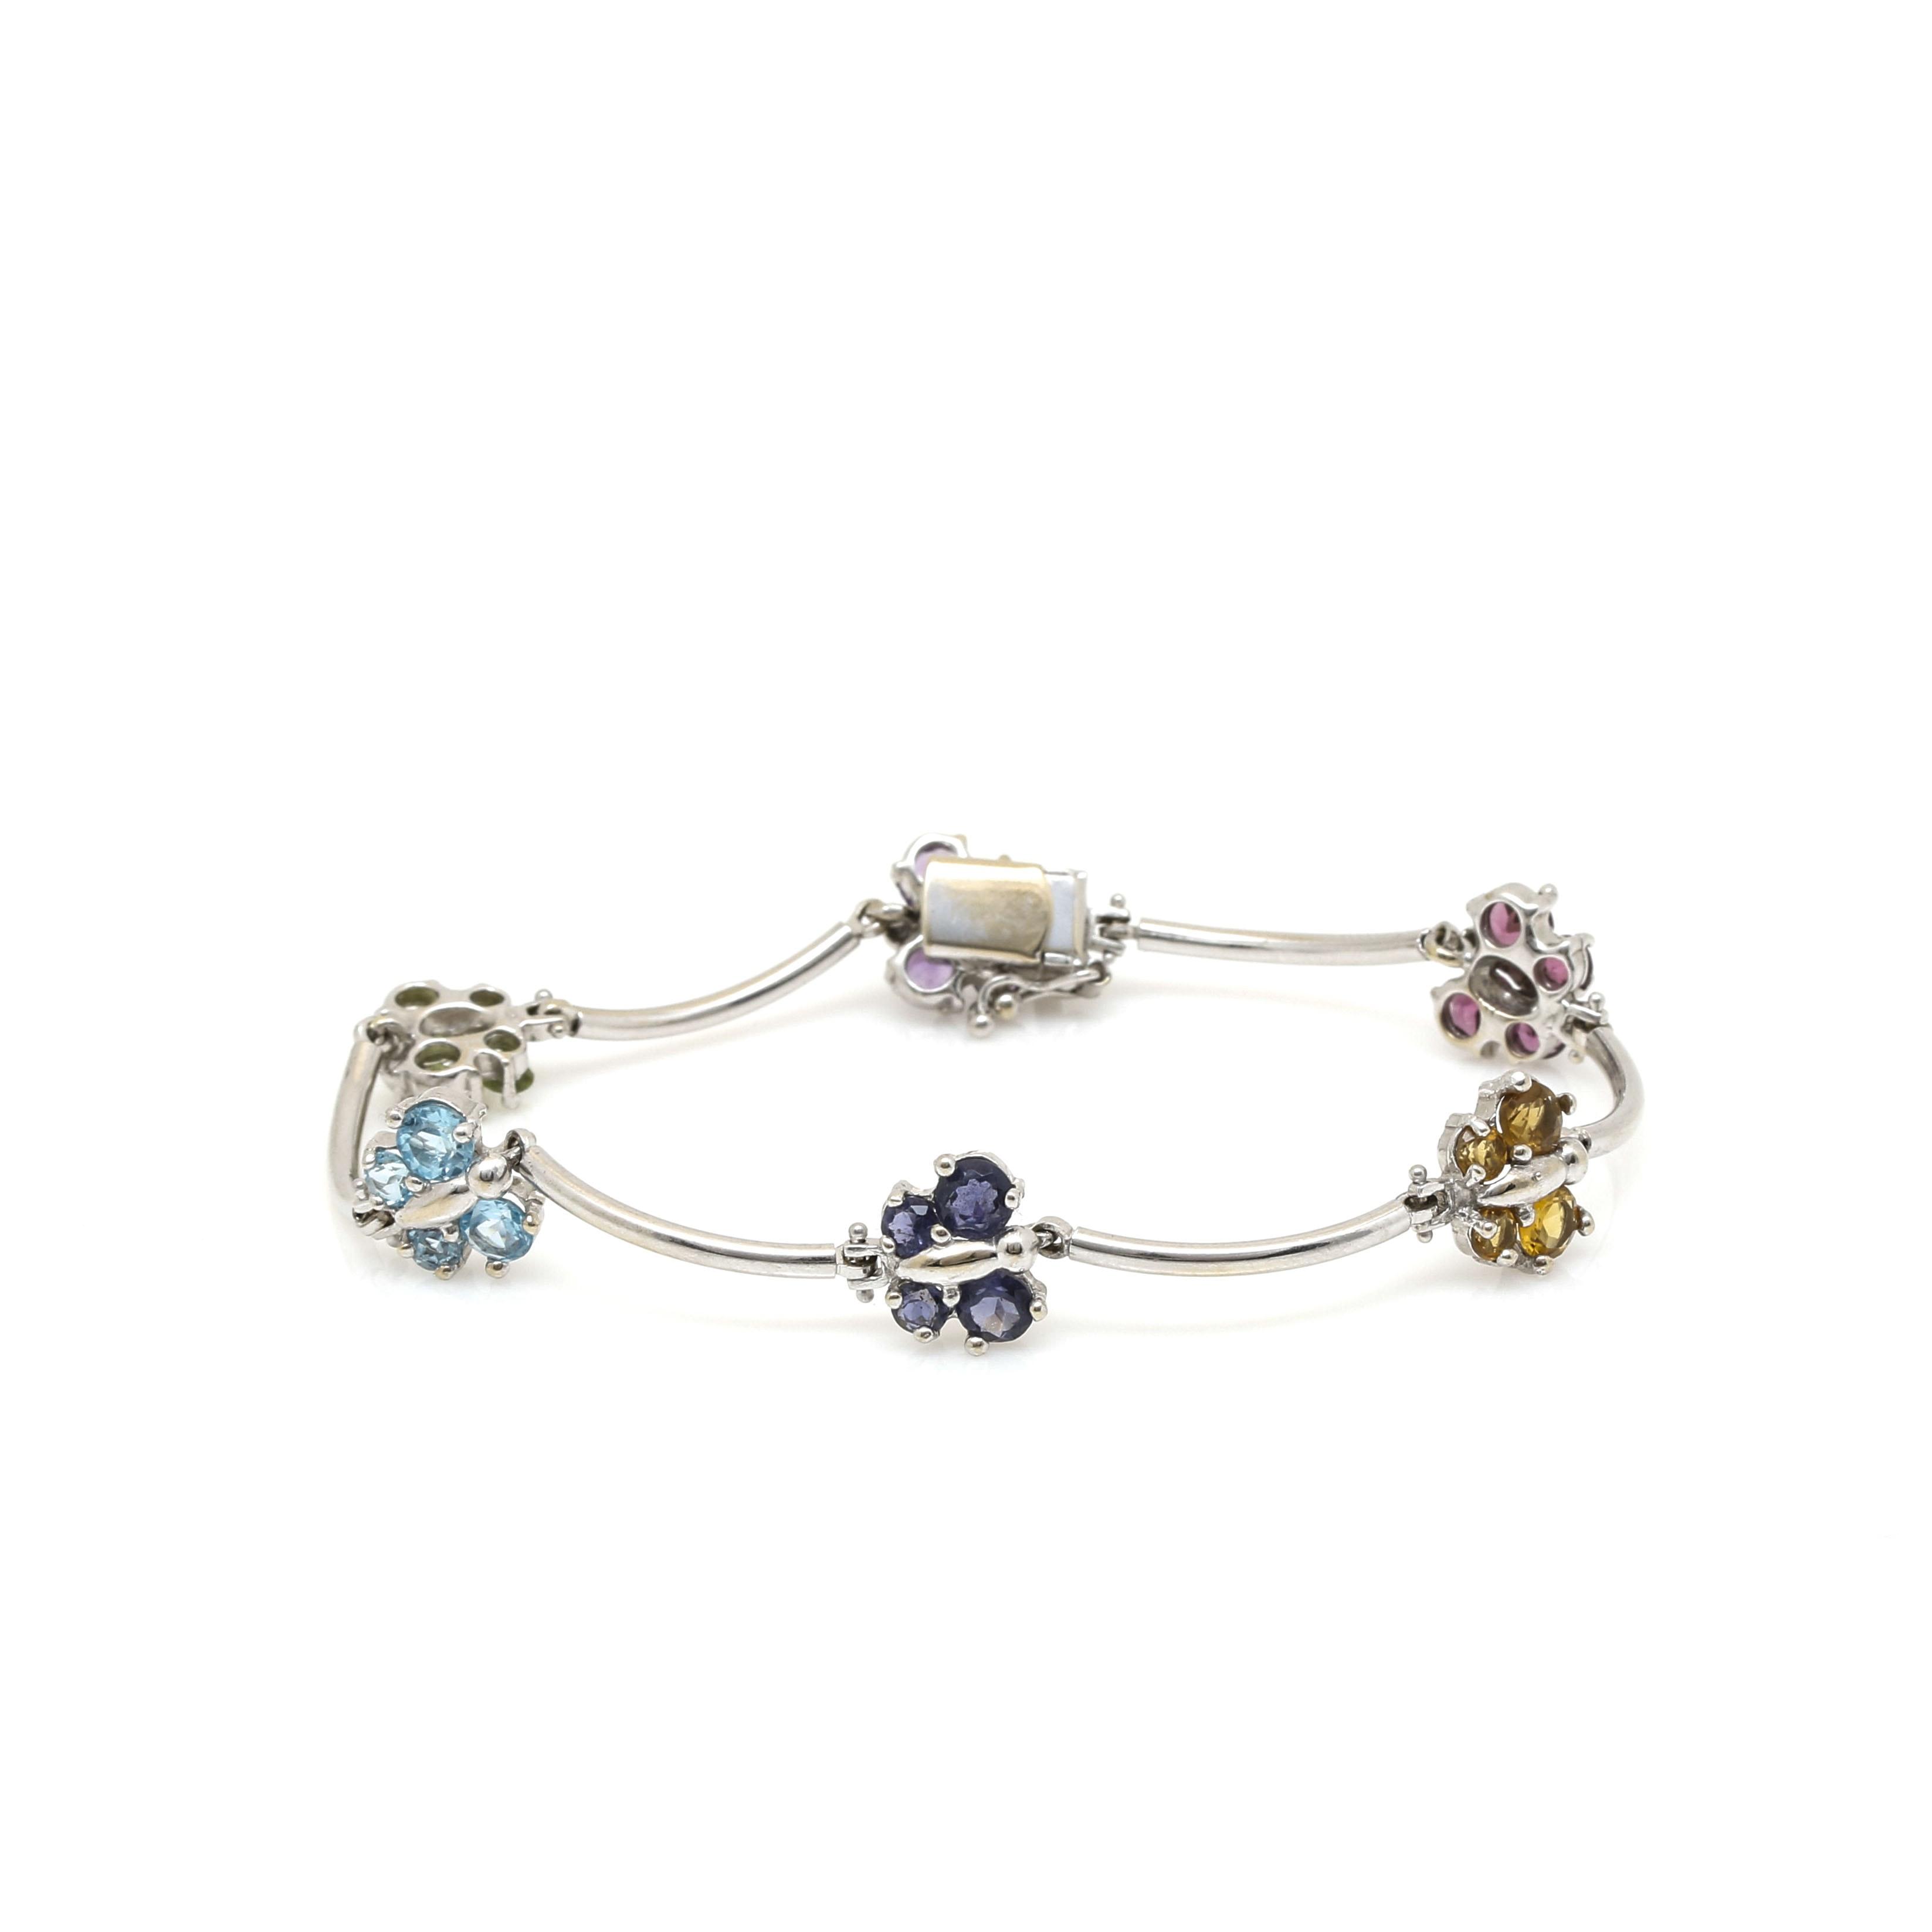 14K White Gold Gemstone Butterfly Bracelet